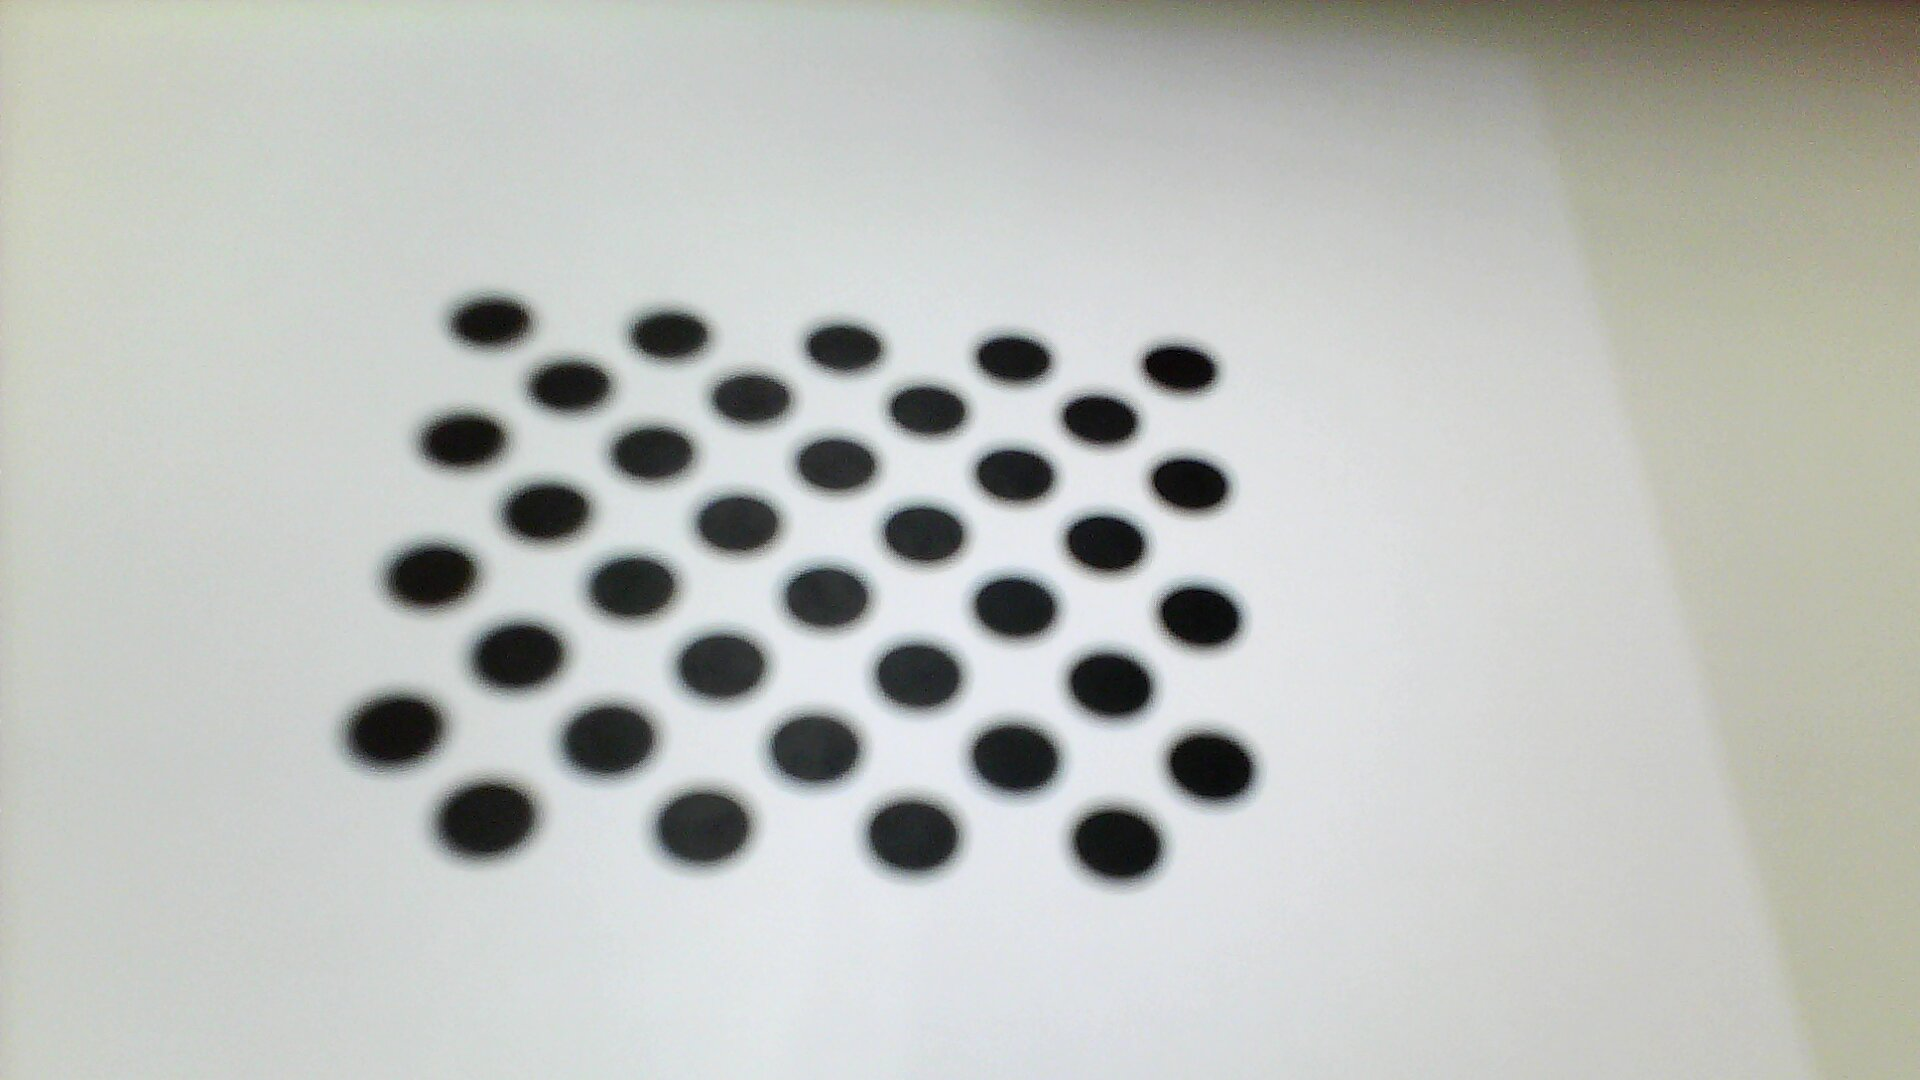 captureAsymmetricalCircle.png